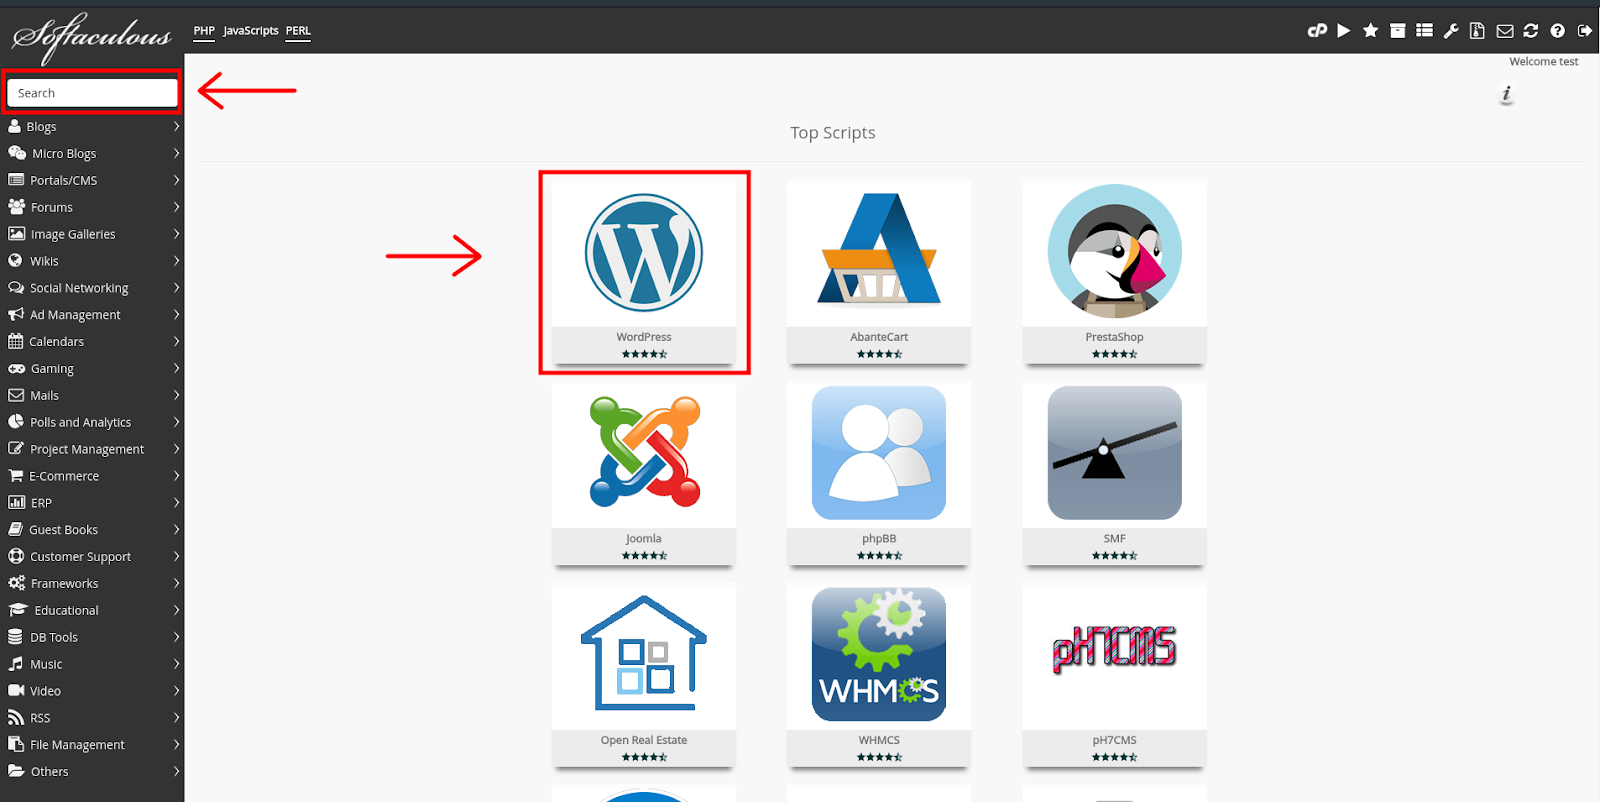 WordPress In Softaculous